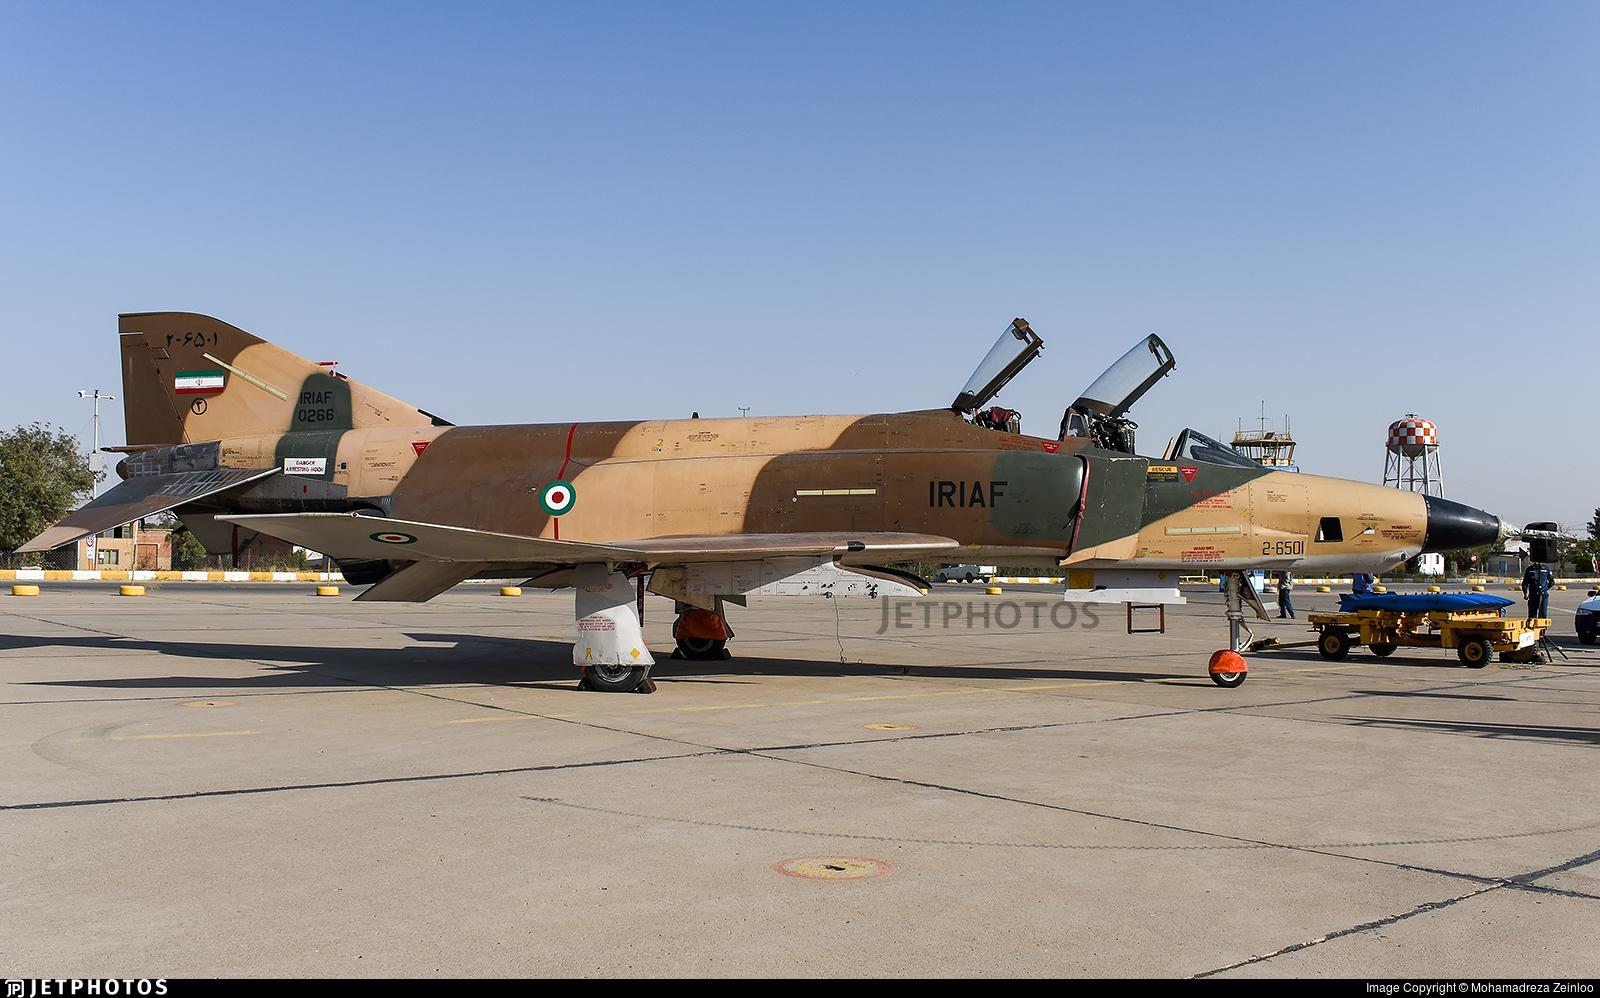 2-6501 - McDonnell Douglas RF-4E Phantom II - Iran - Air Force